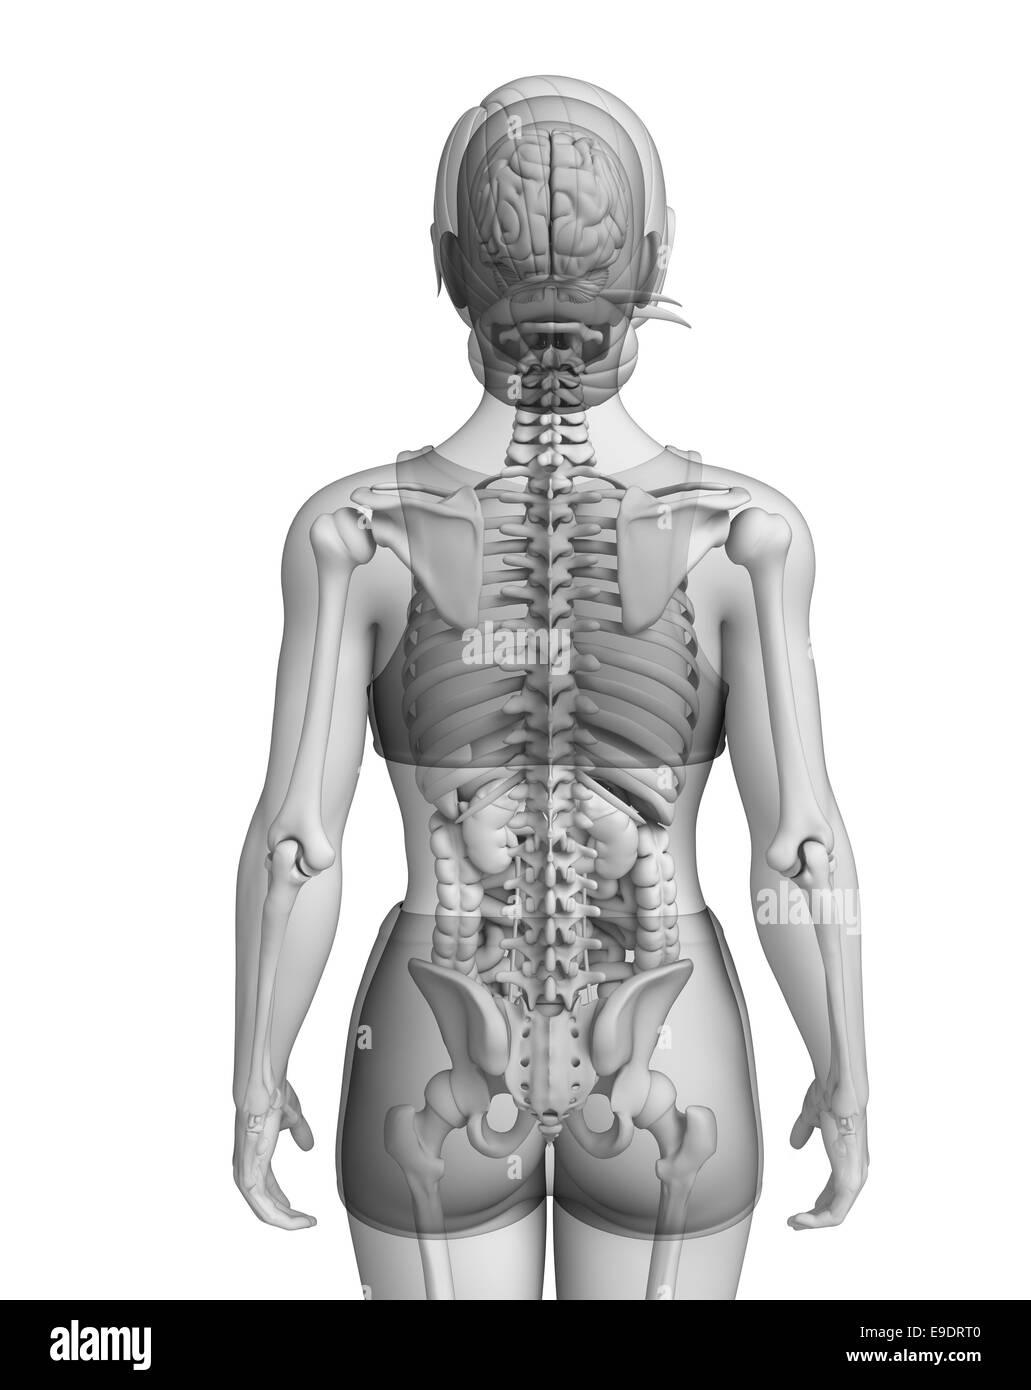 Female Digestive System Stock Photos & Female Digestive System Stock ...